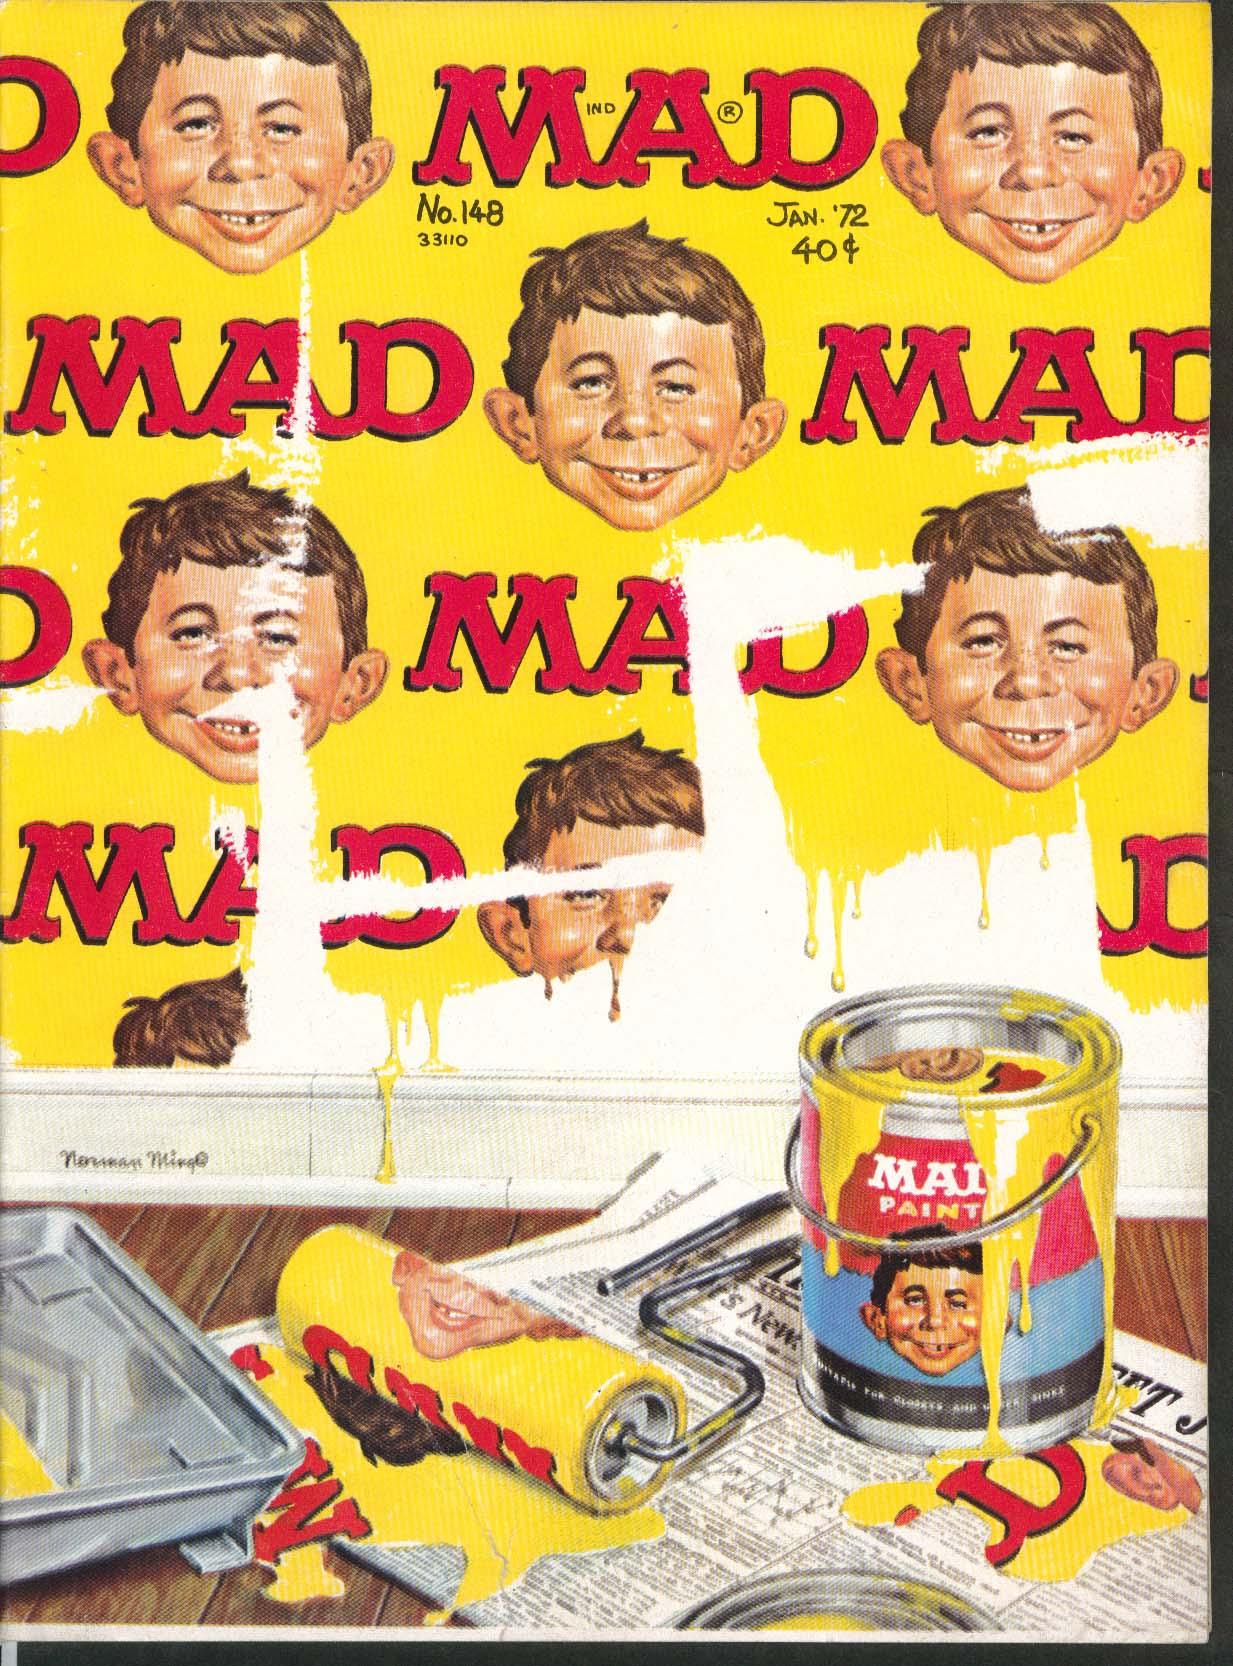 MAD #148 Charlie Brown Schulz Peanuts Parody Summer of '42 Thanksgiving 1 1972